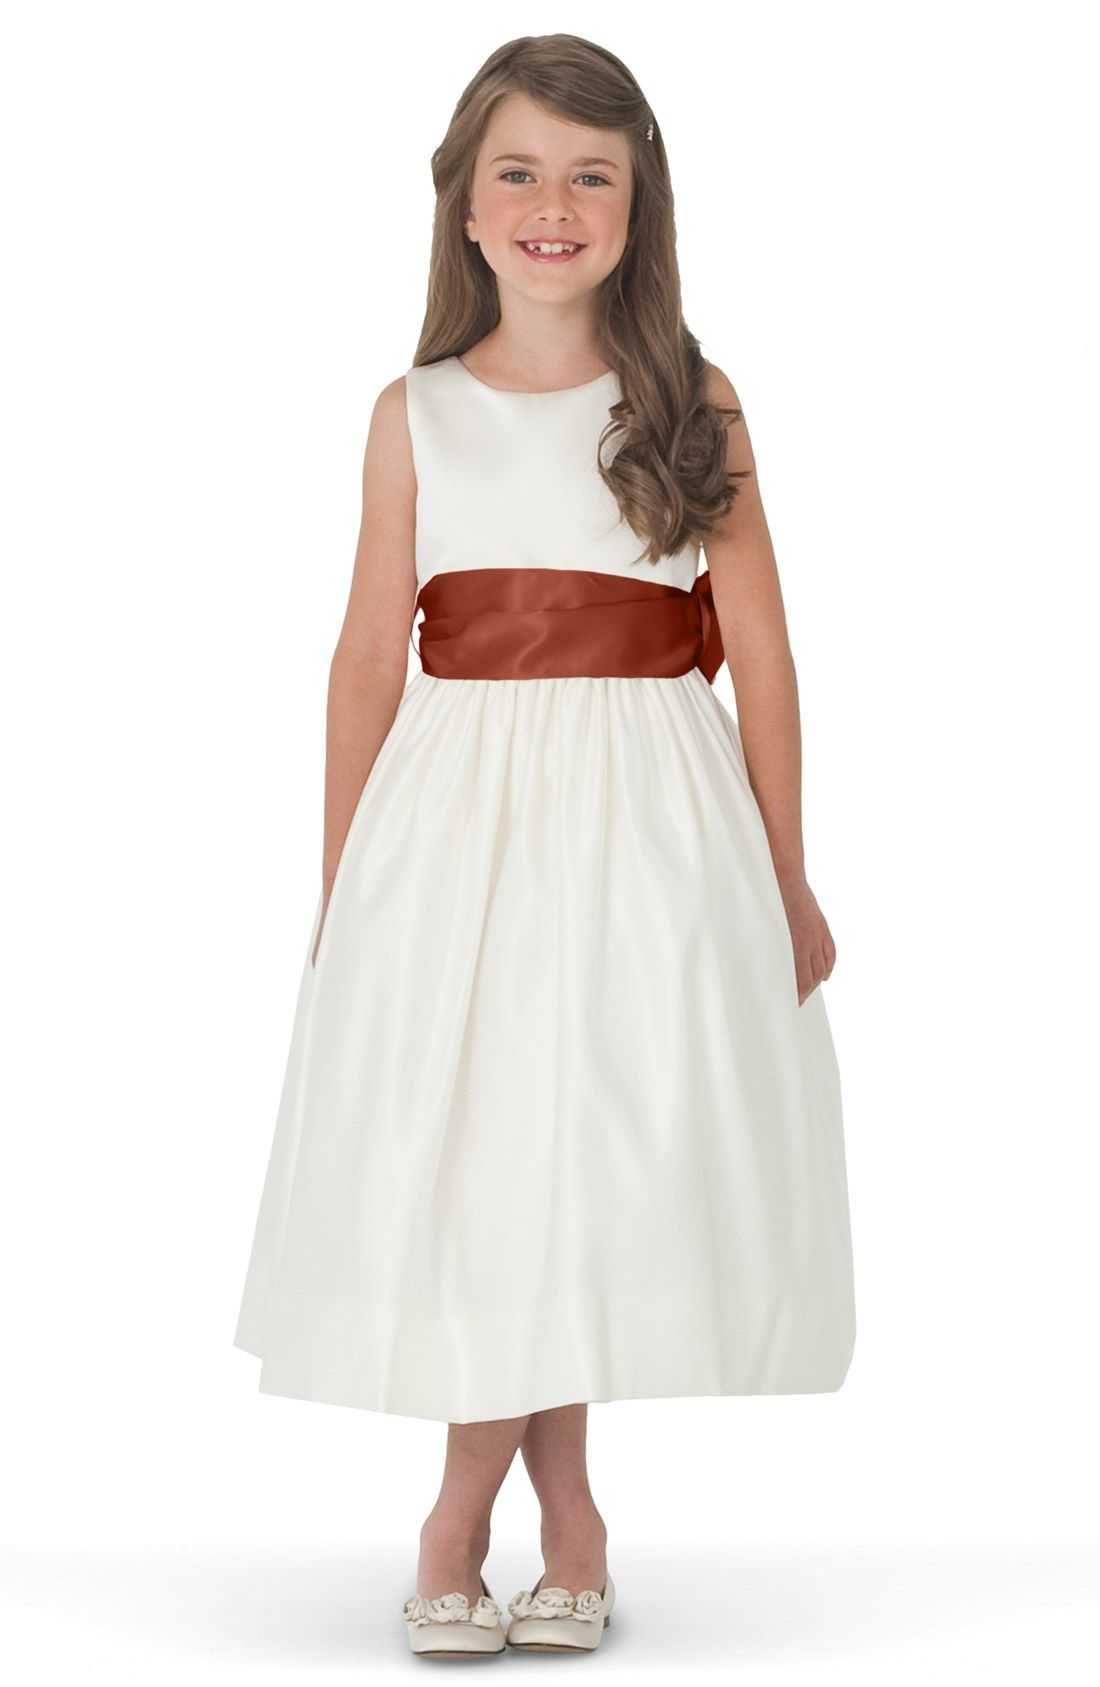 493fd4a50c3b4 Us Angels Ivory Satin Tank Dress (Toddler